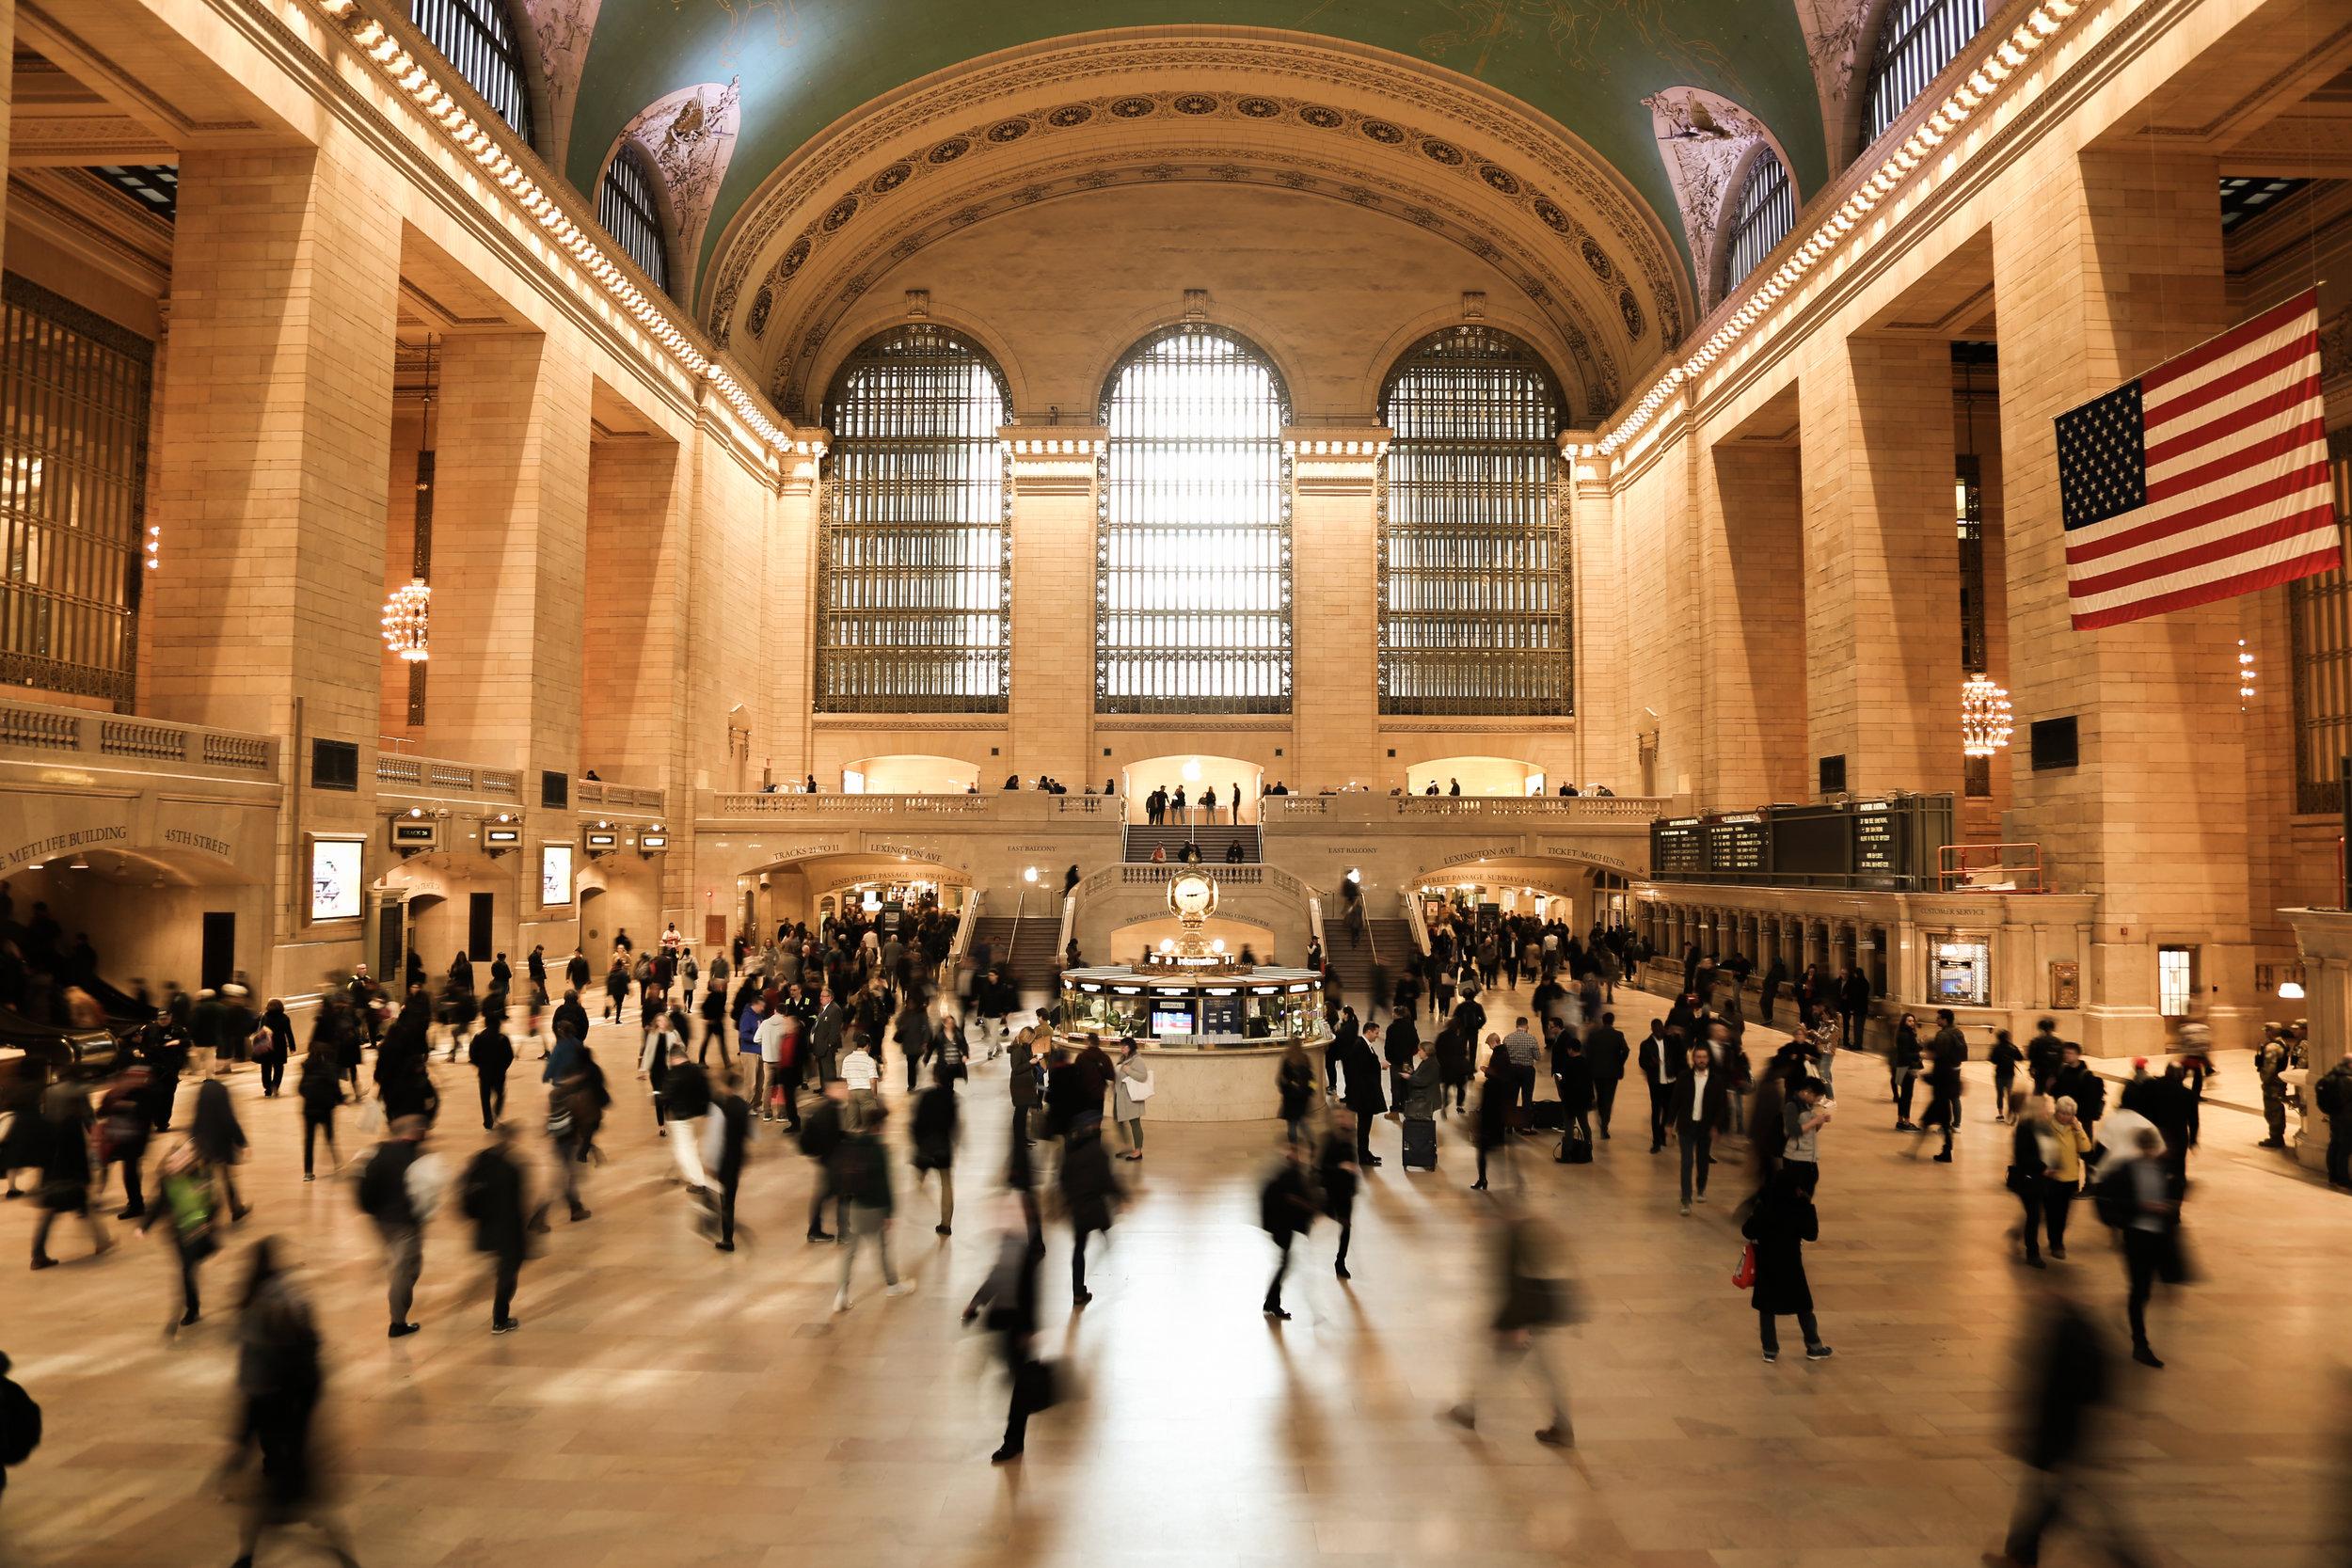 grand-central-terminal-new-york.jpg